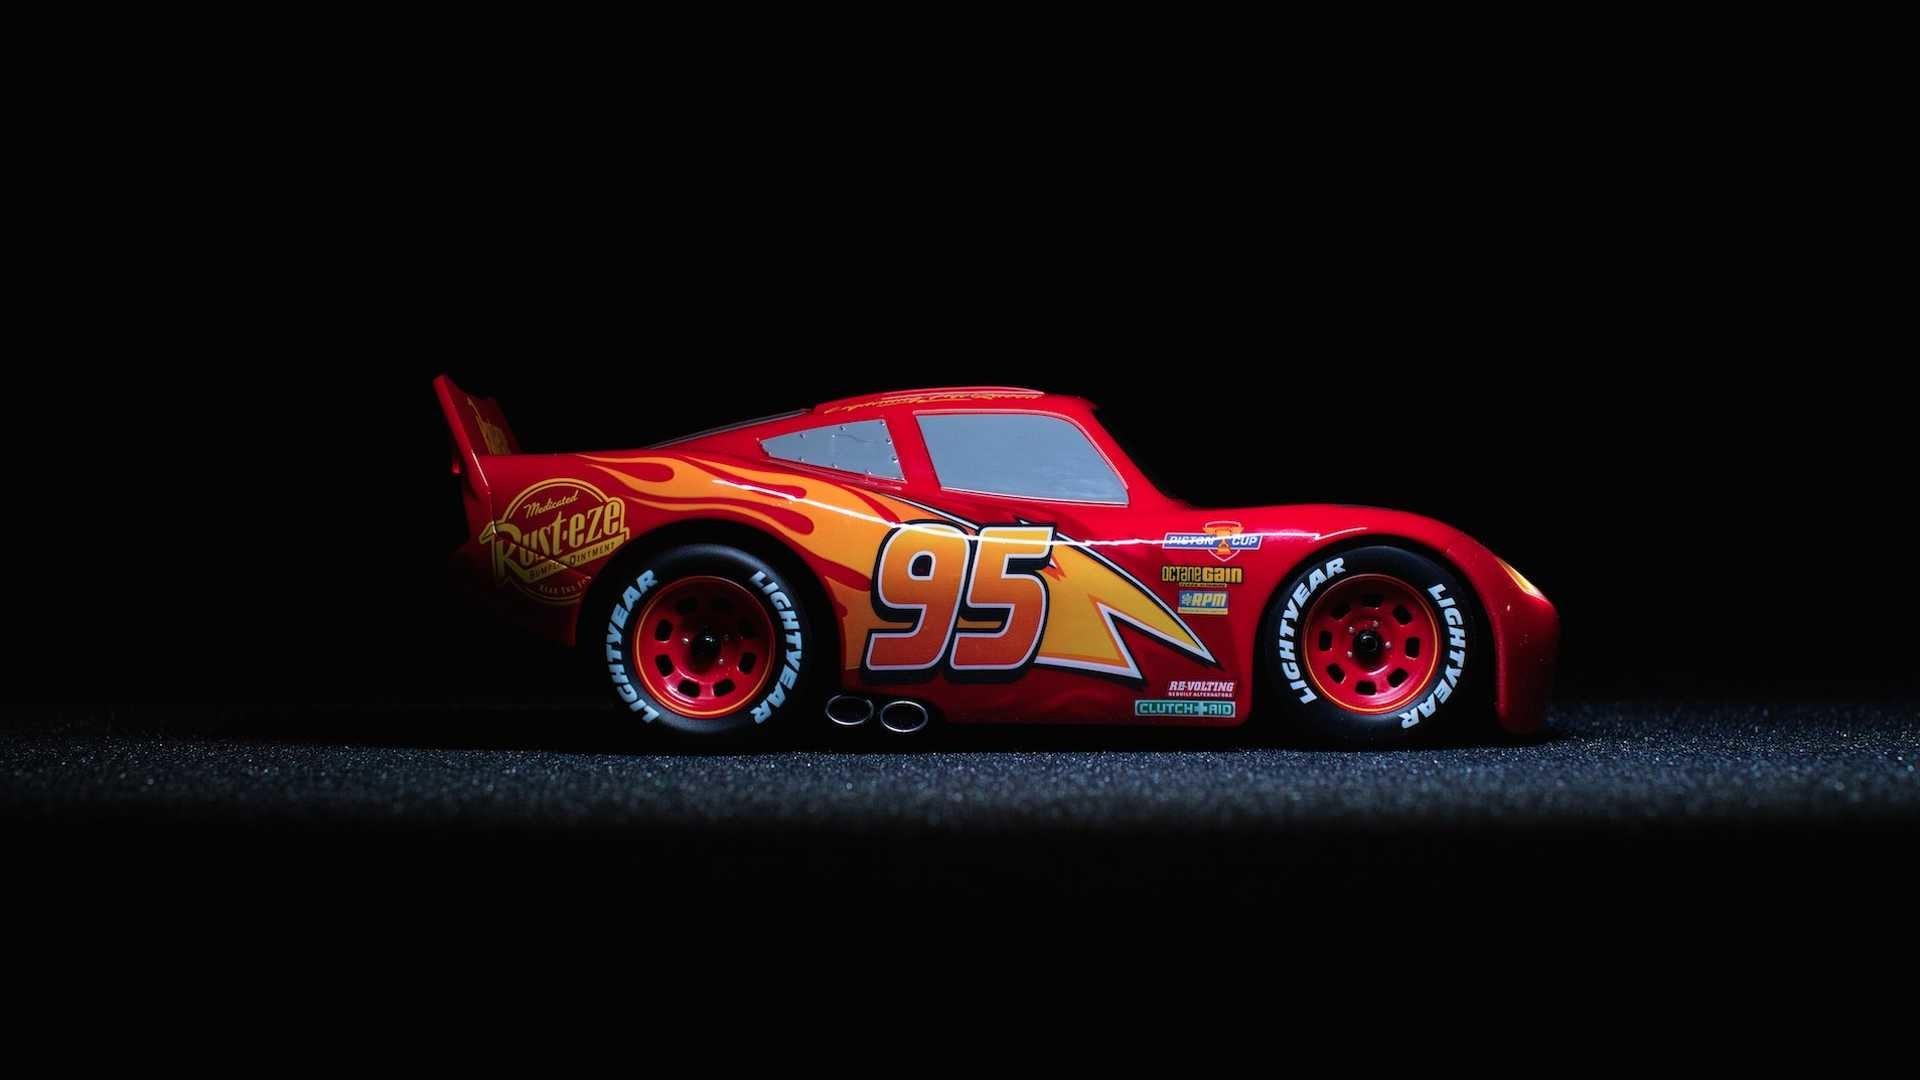 Cars Mcqueen Wallpaper Hd Best Cars Wallpapers